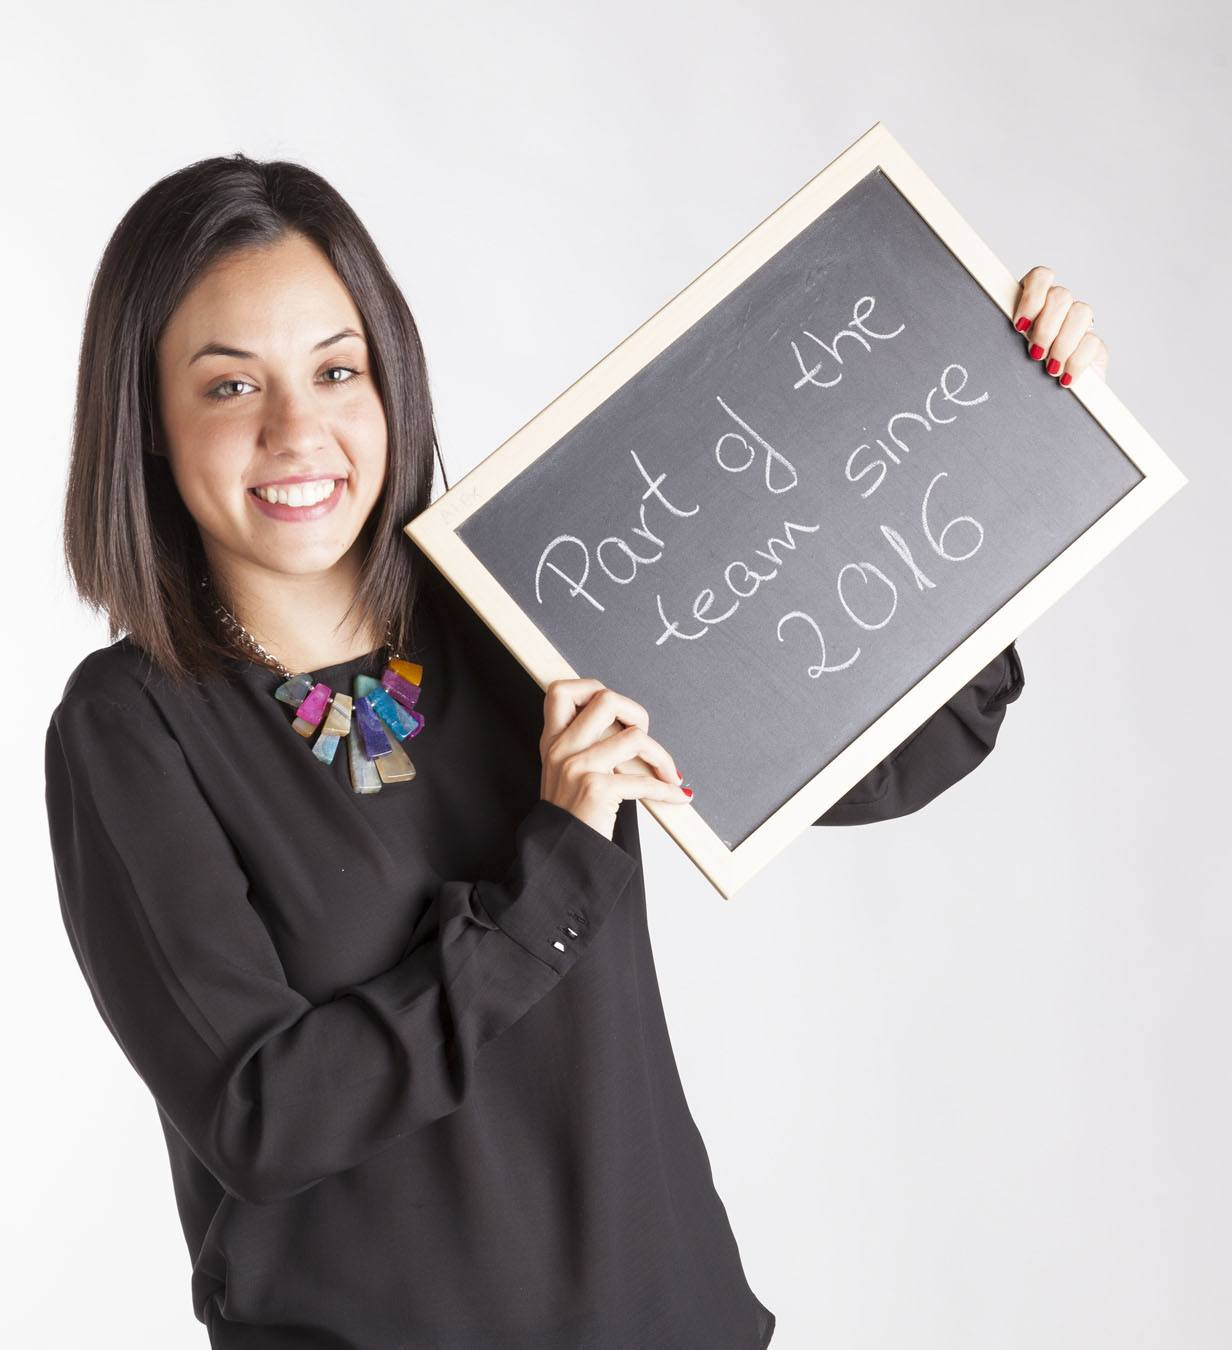 María García - Spanish Teacher